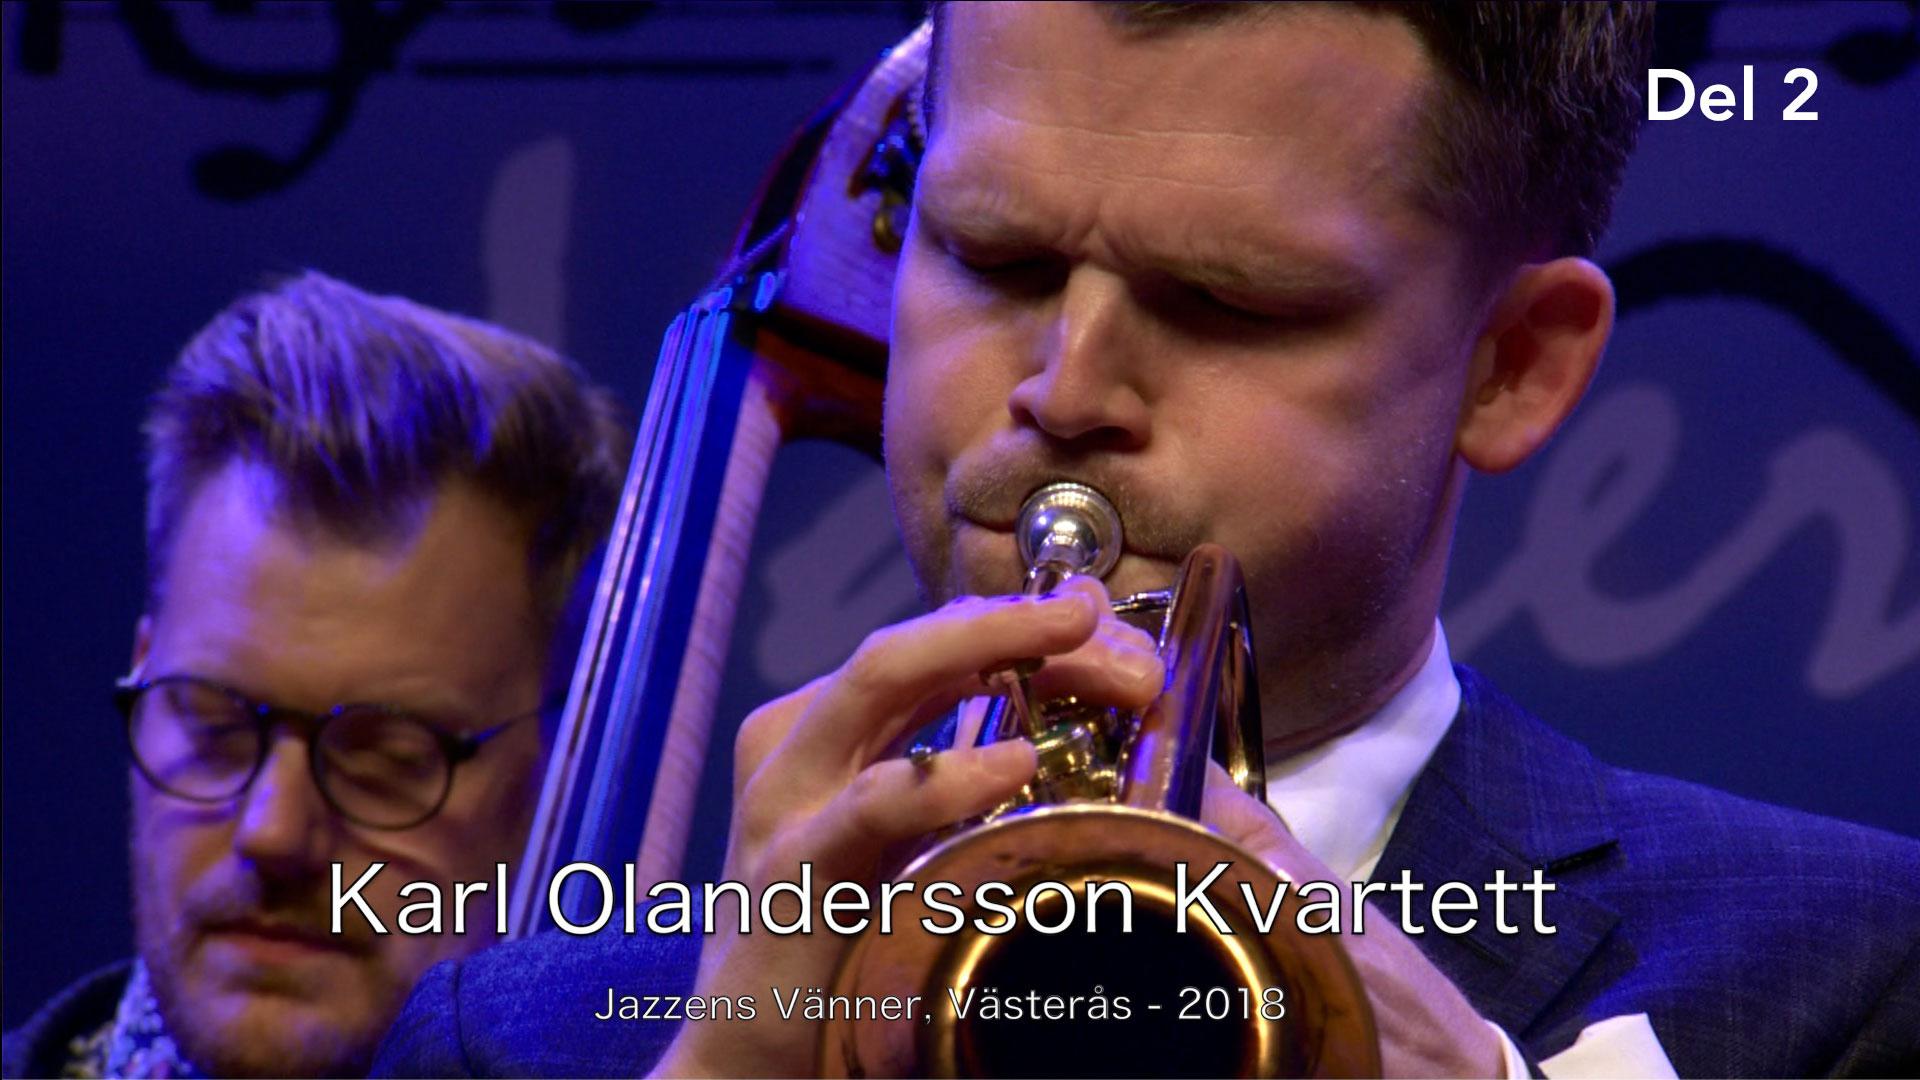 Karl Olandersson Kvartet